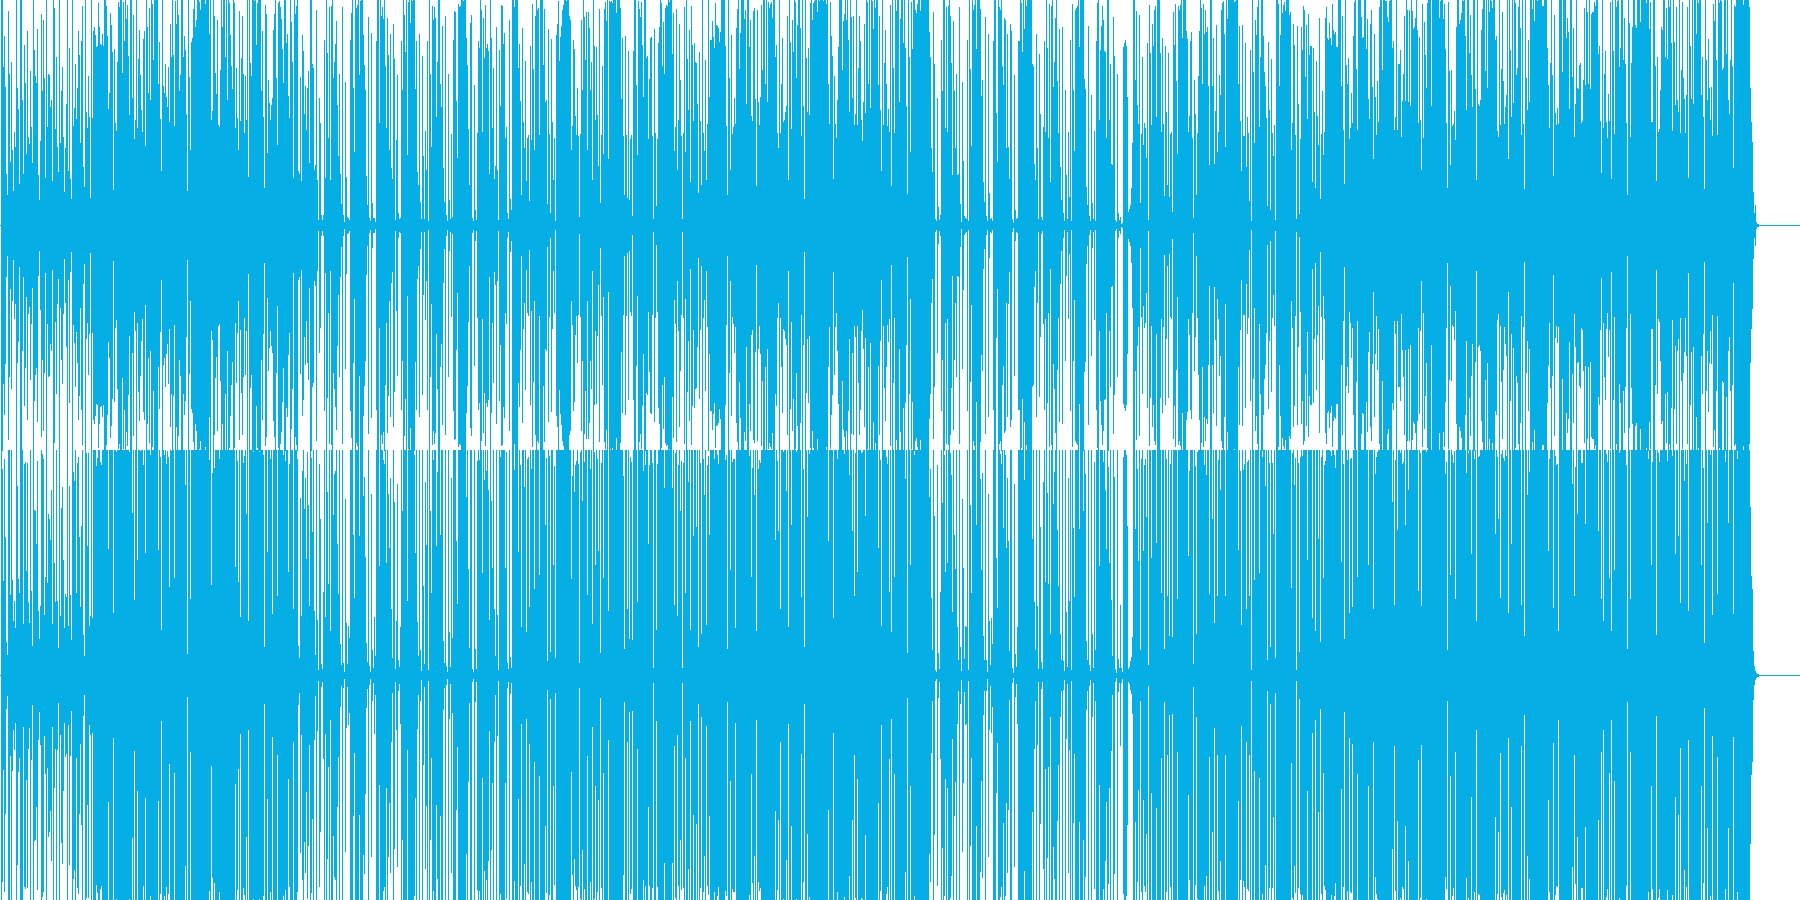 Trap サウス ビート の再生済みの波形